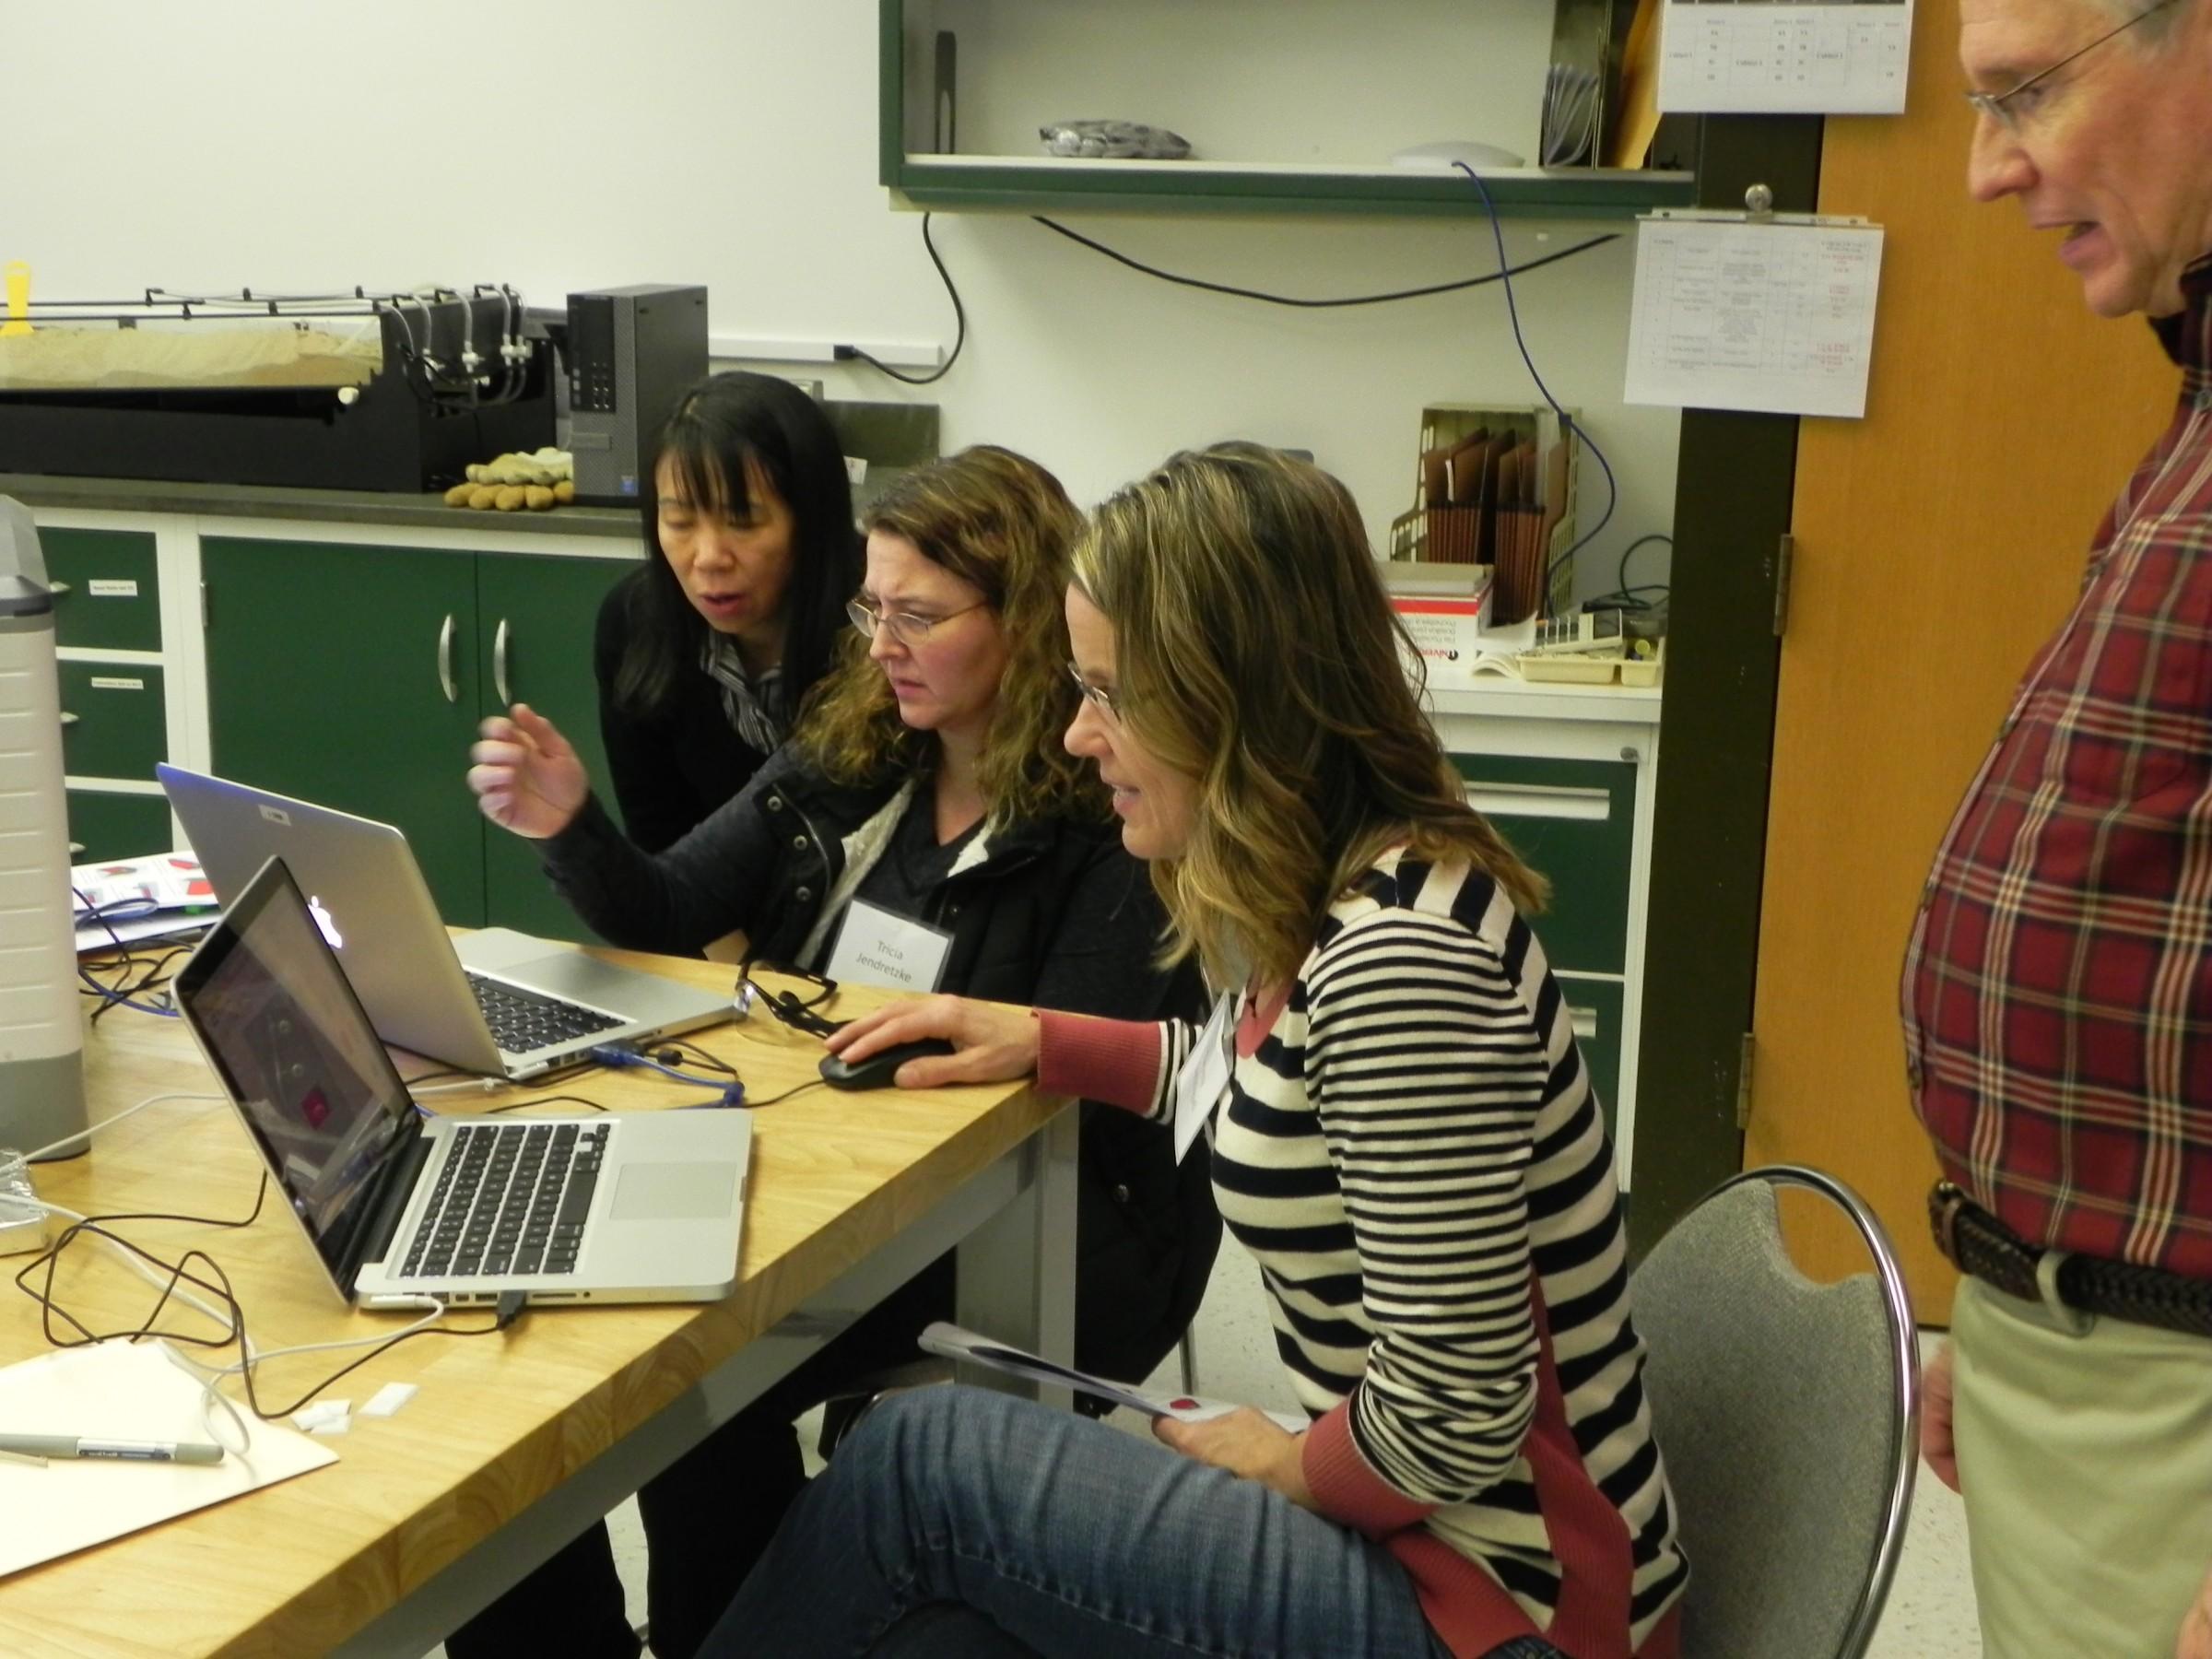 Teachers gathered around a computer